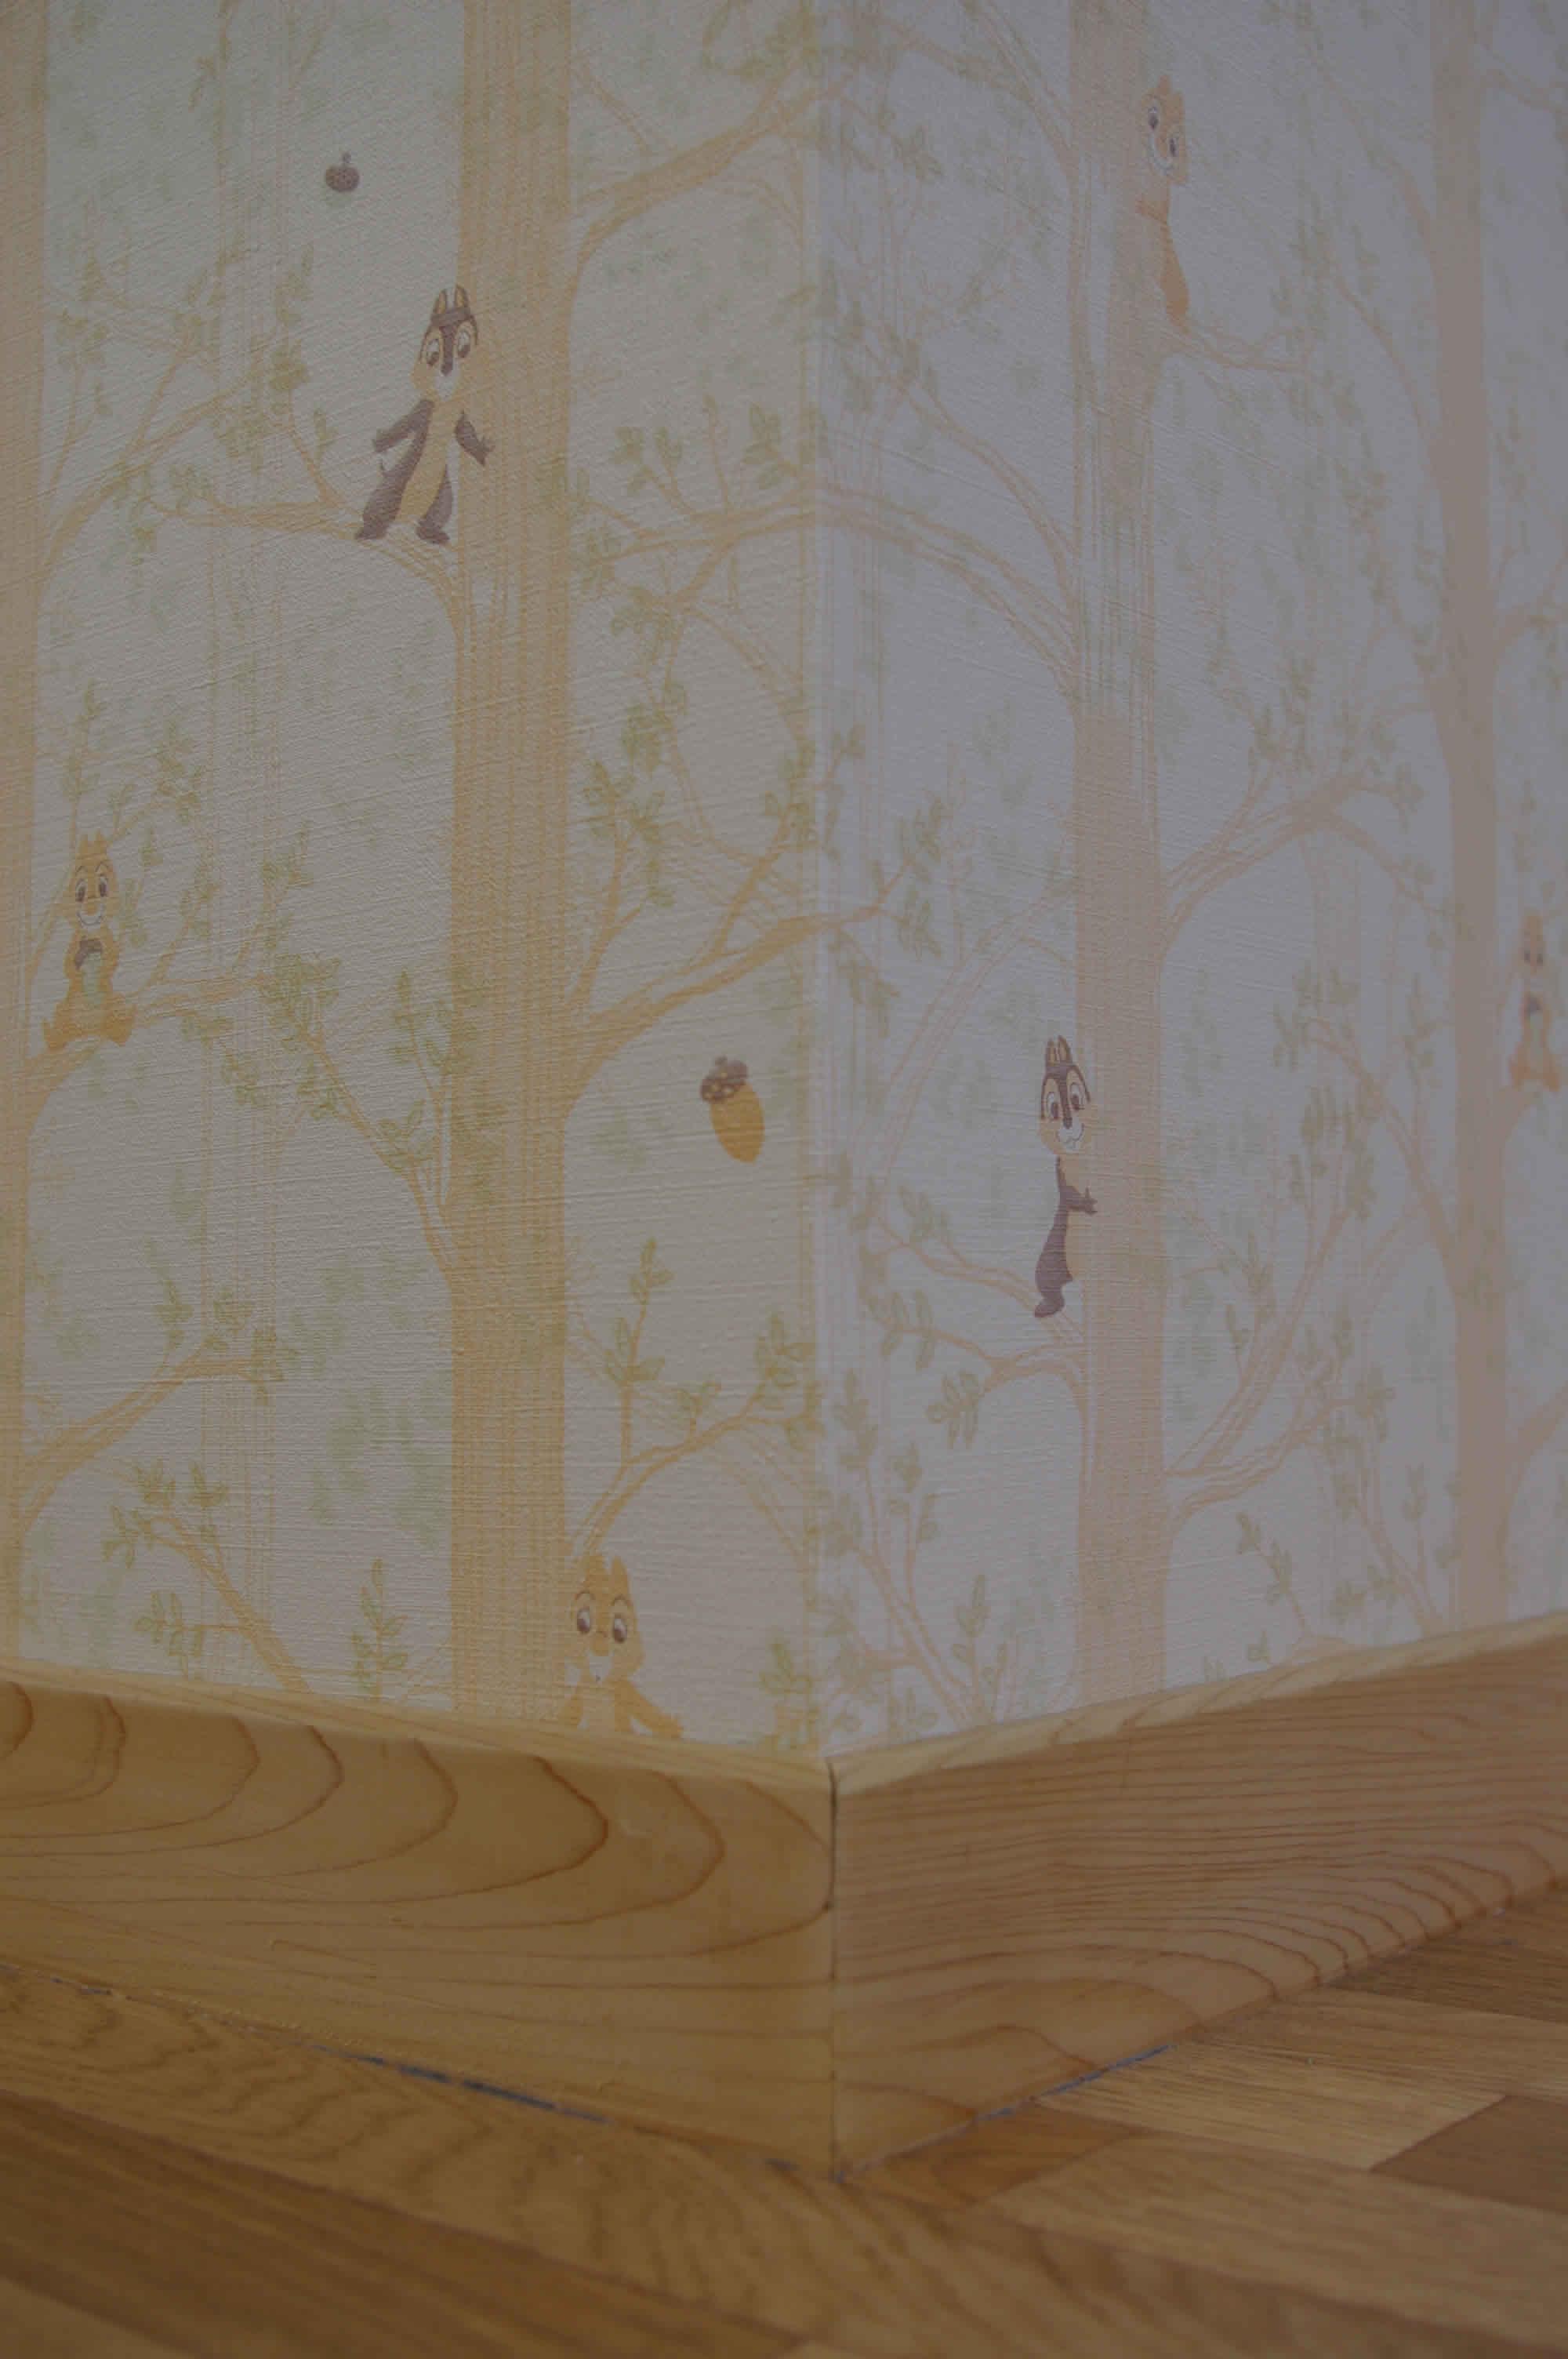 E 11 壁紙 クロス 自分でできる 生のり付壁紙 クロス 珪藻土の塗り壁材の販売 ウォールスタイル